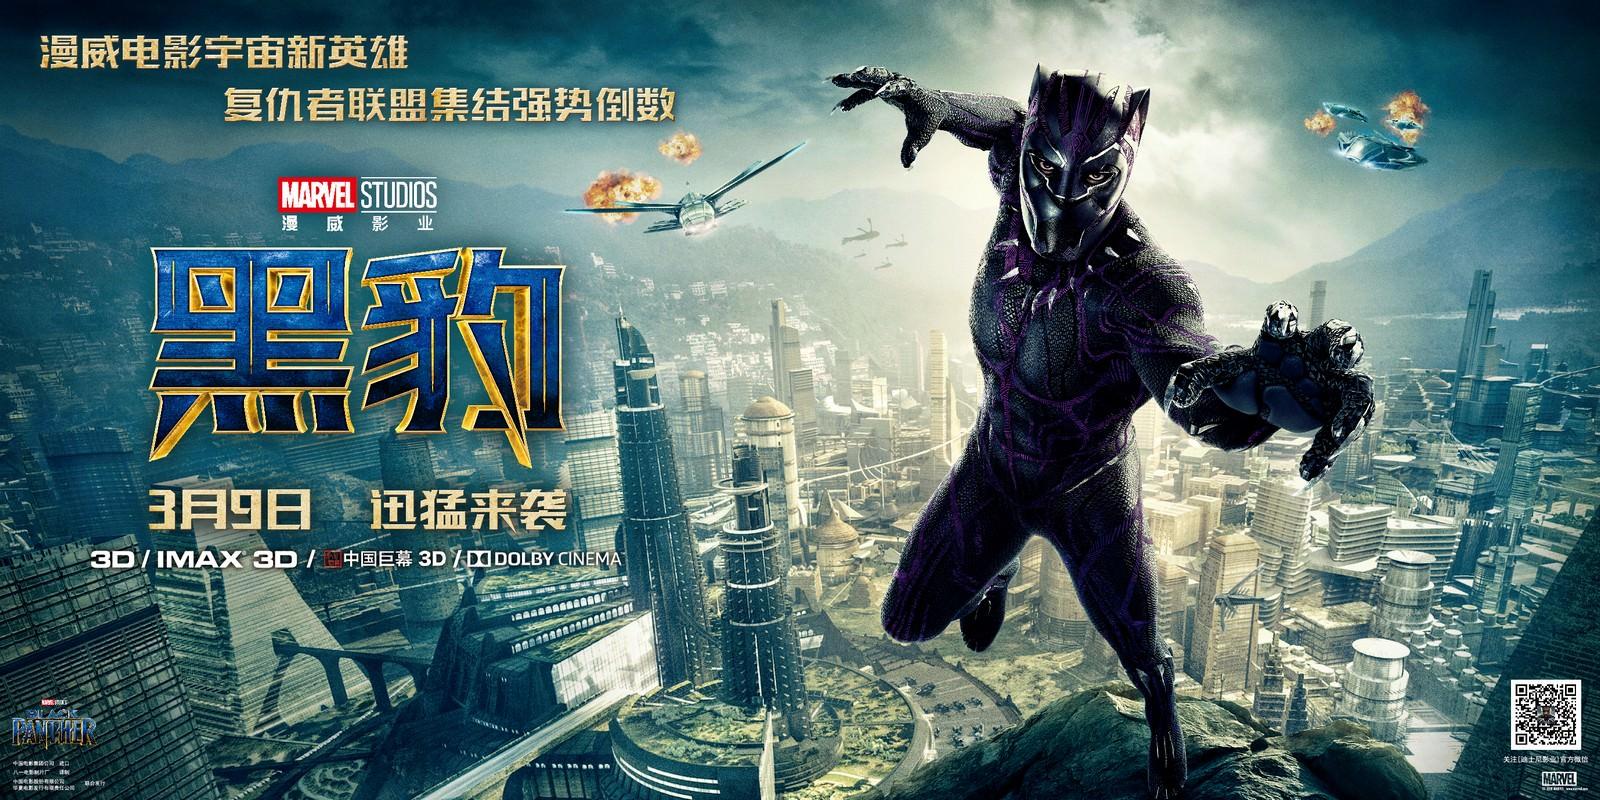 Movie, Black Panther(美國) / 黑豹(台.中.港), 電影海報, 中國, 橫板